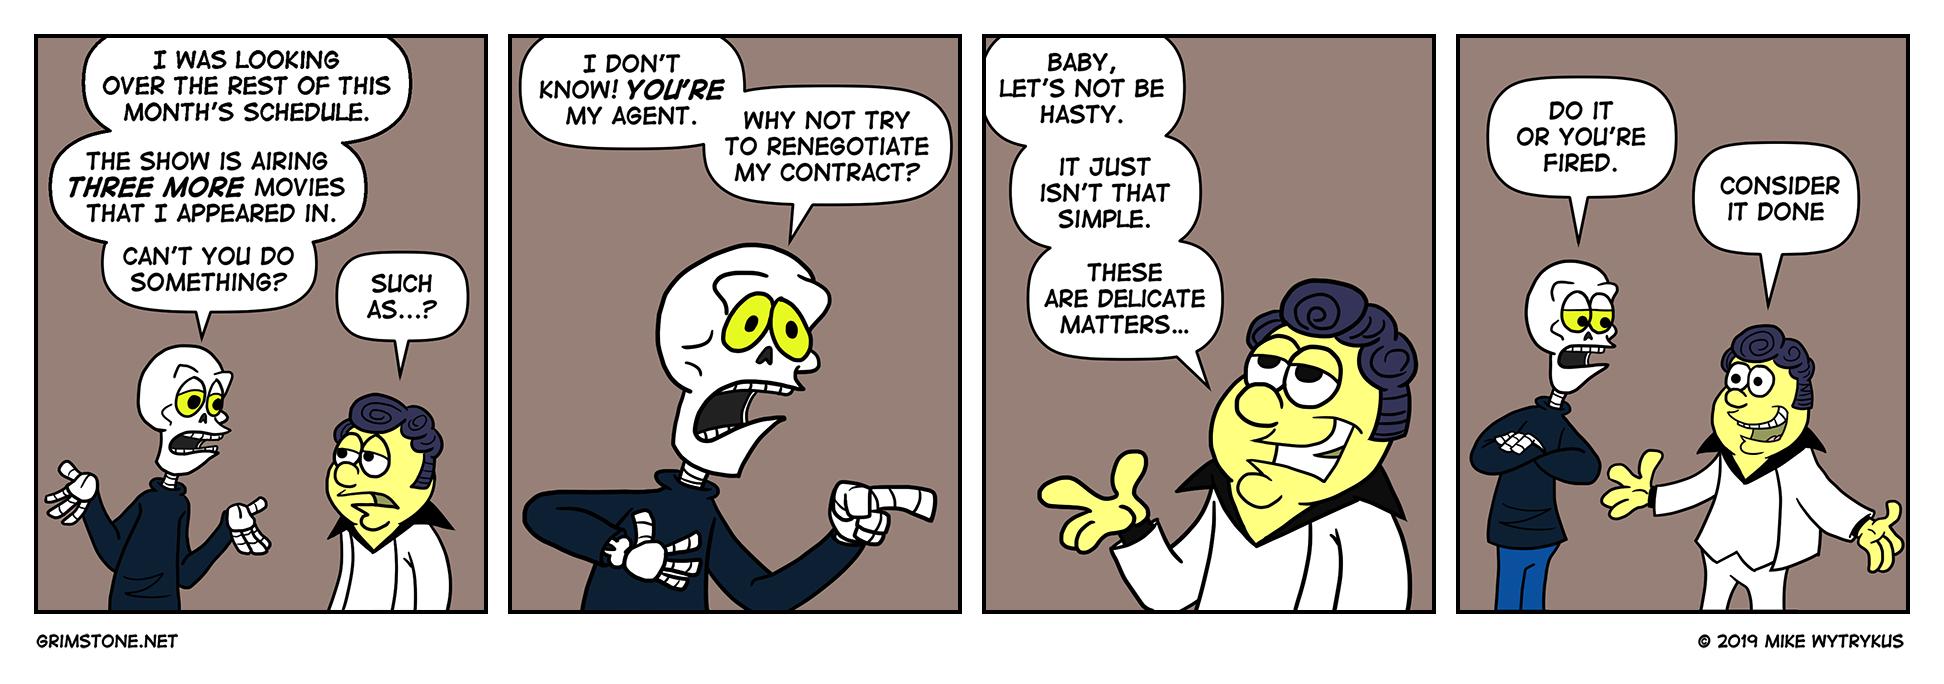 Serving the Client